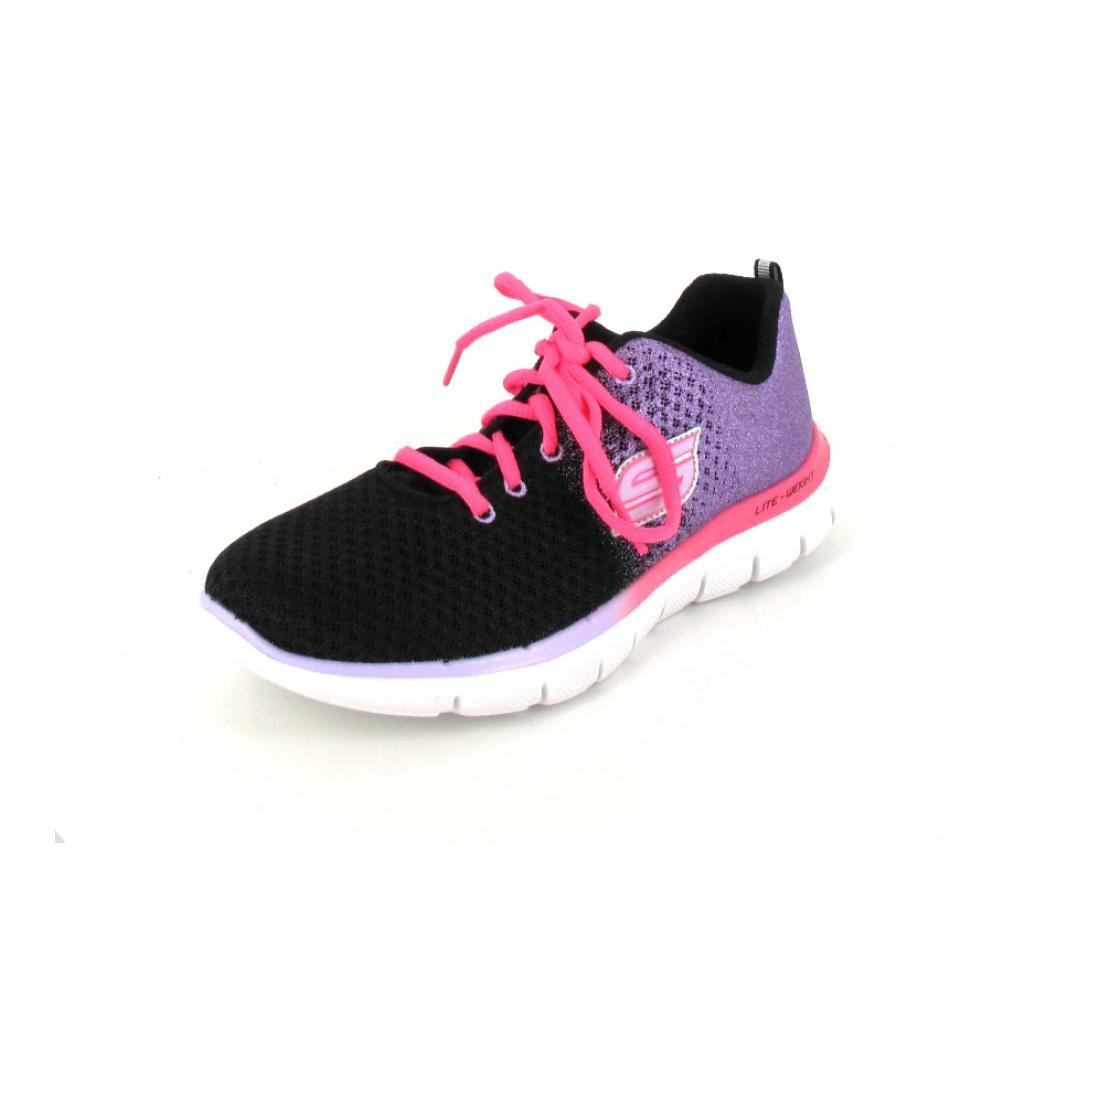 Skechers Sneaker APPEAL 2.0 GET EM G